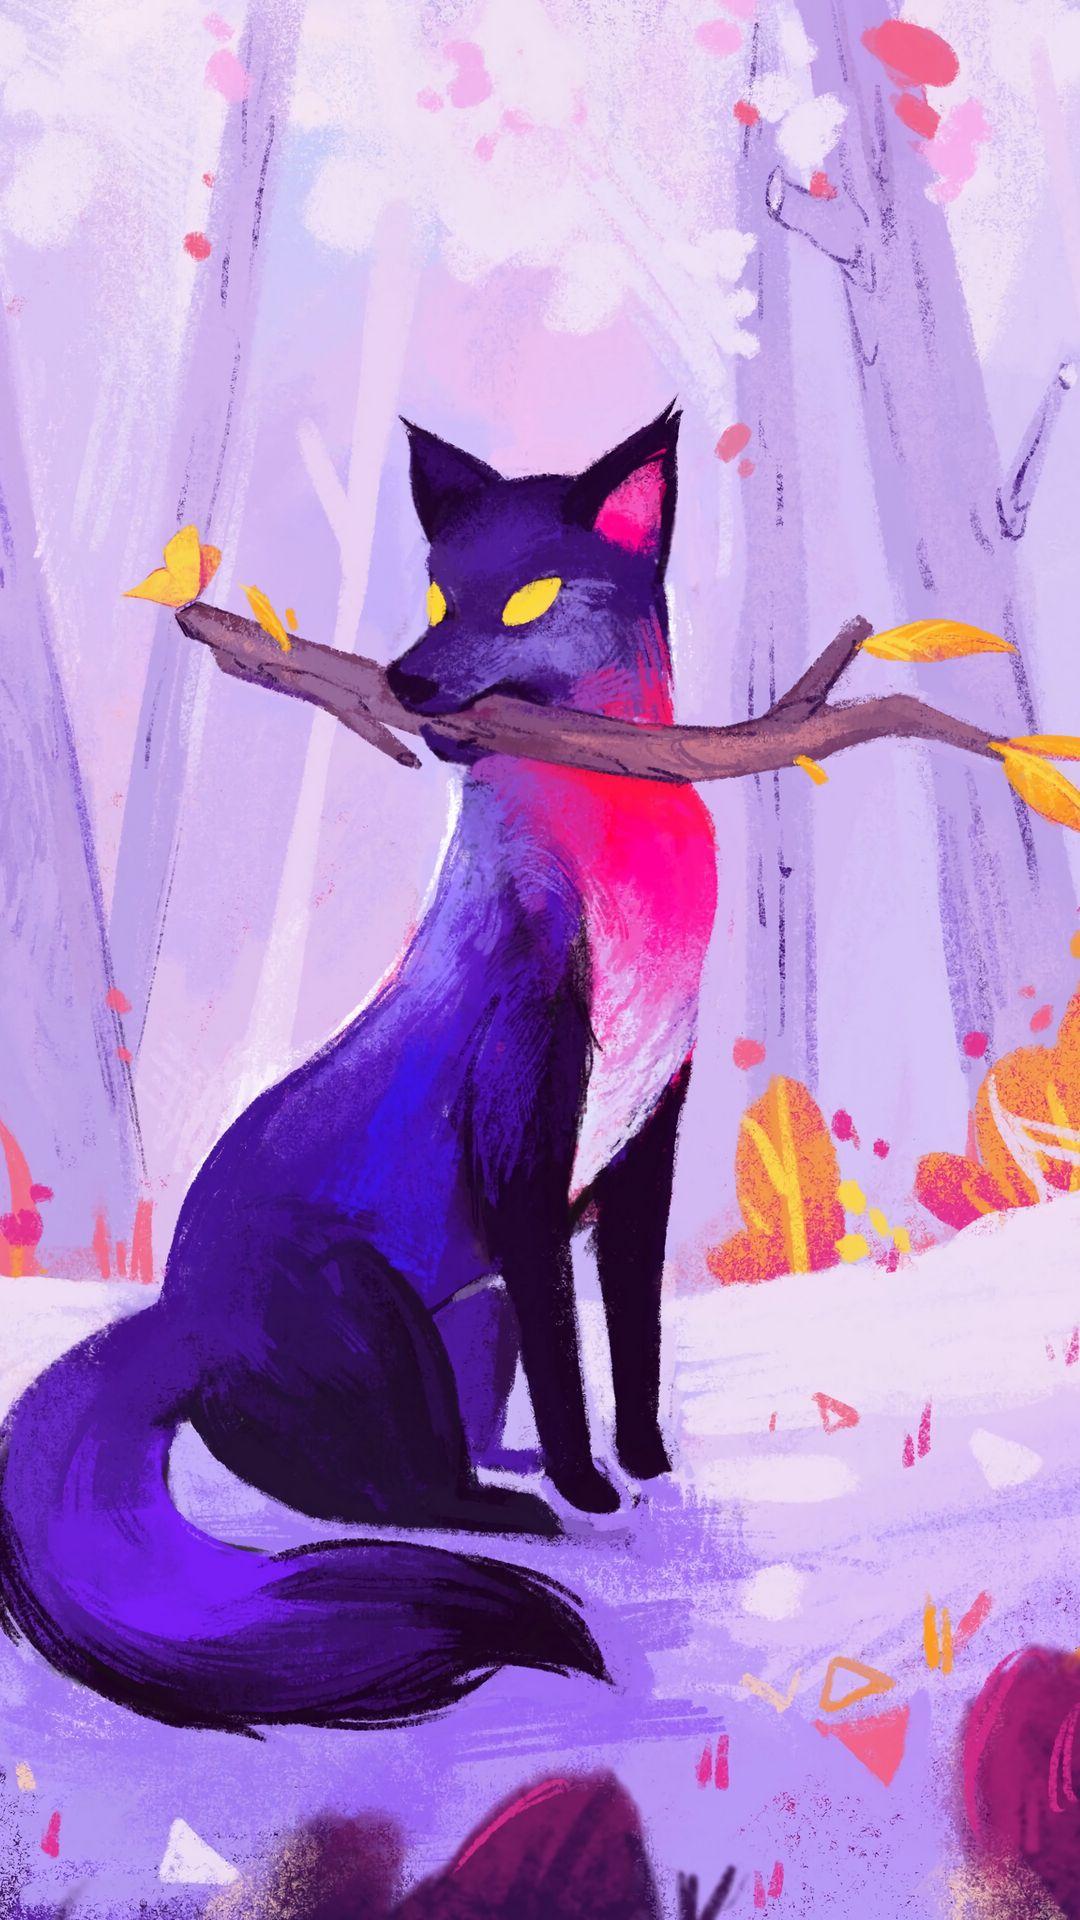 1080x1920 Wallpaper fox, stick, autumn, art, purple